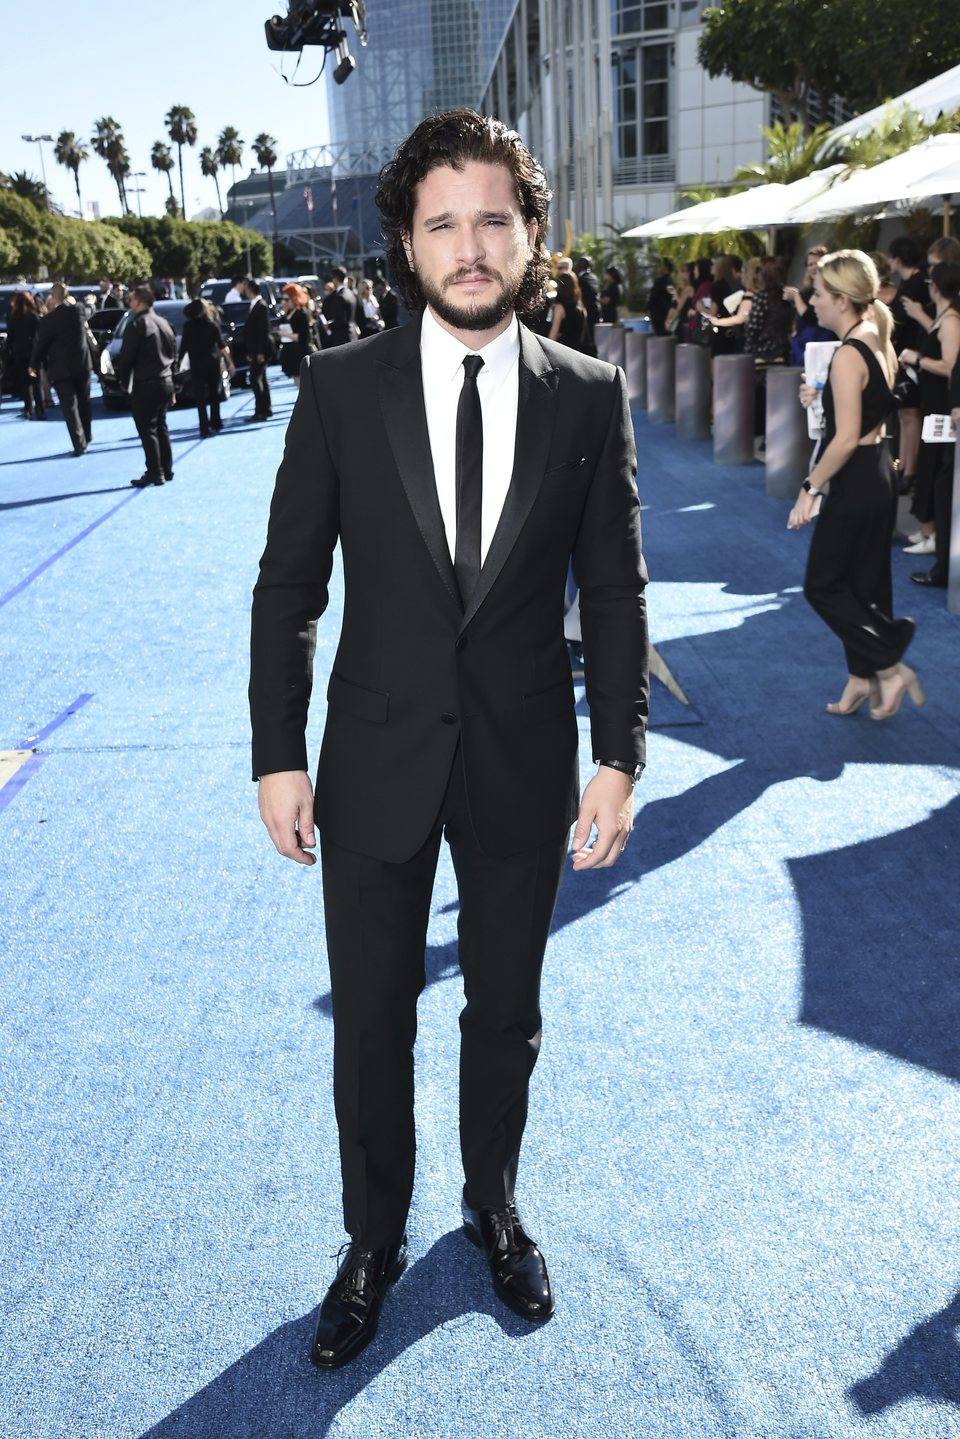 Kit Harington at the Emmys 2018 red carpet